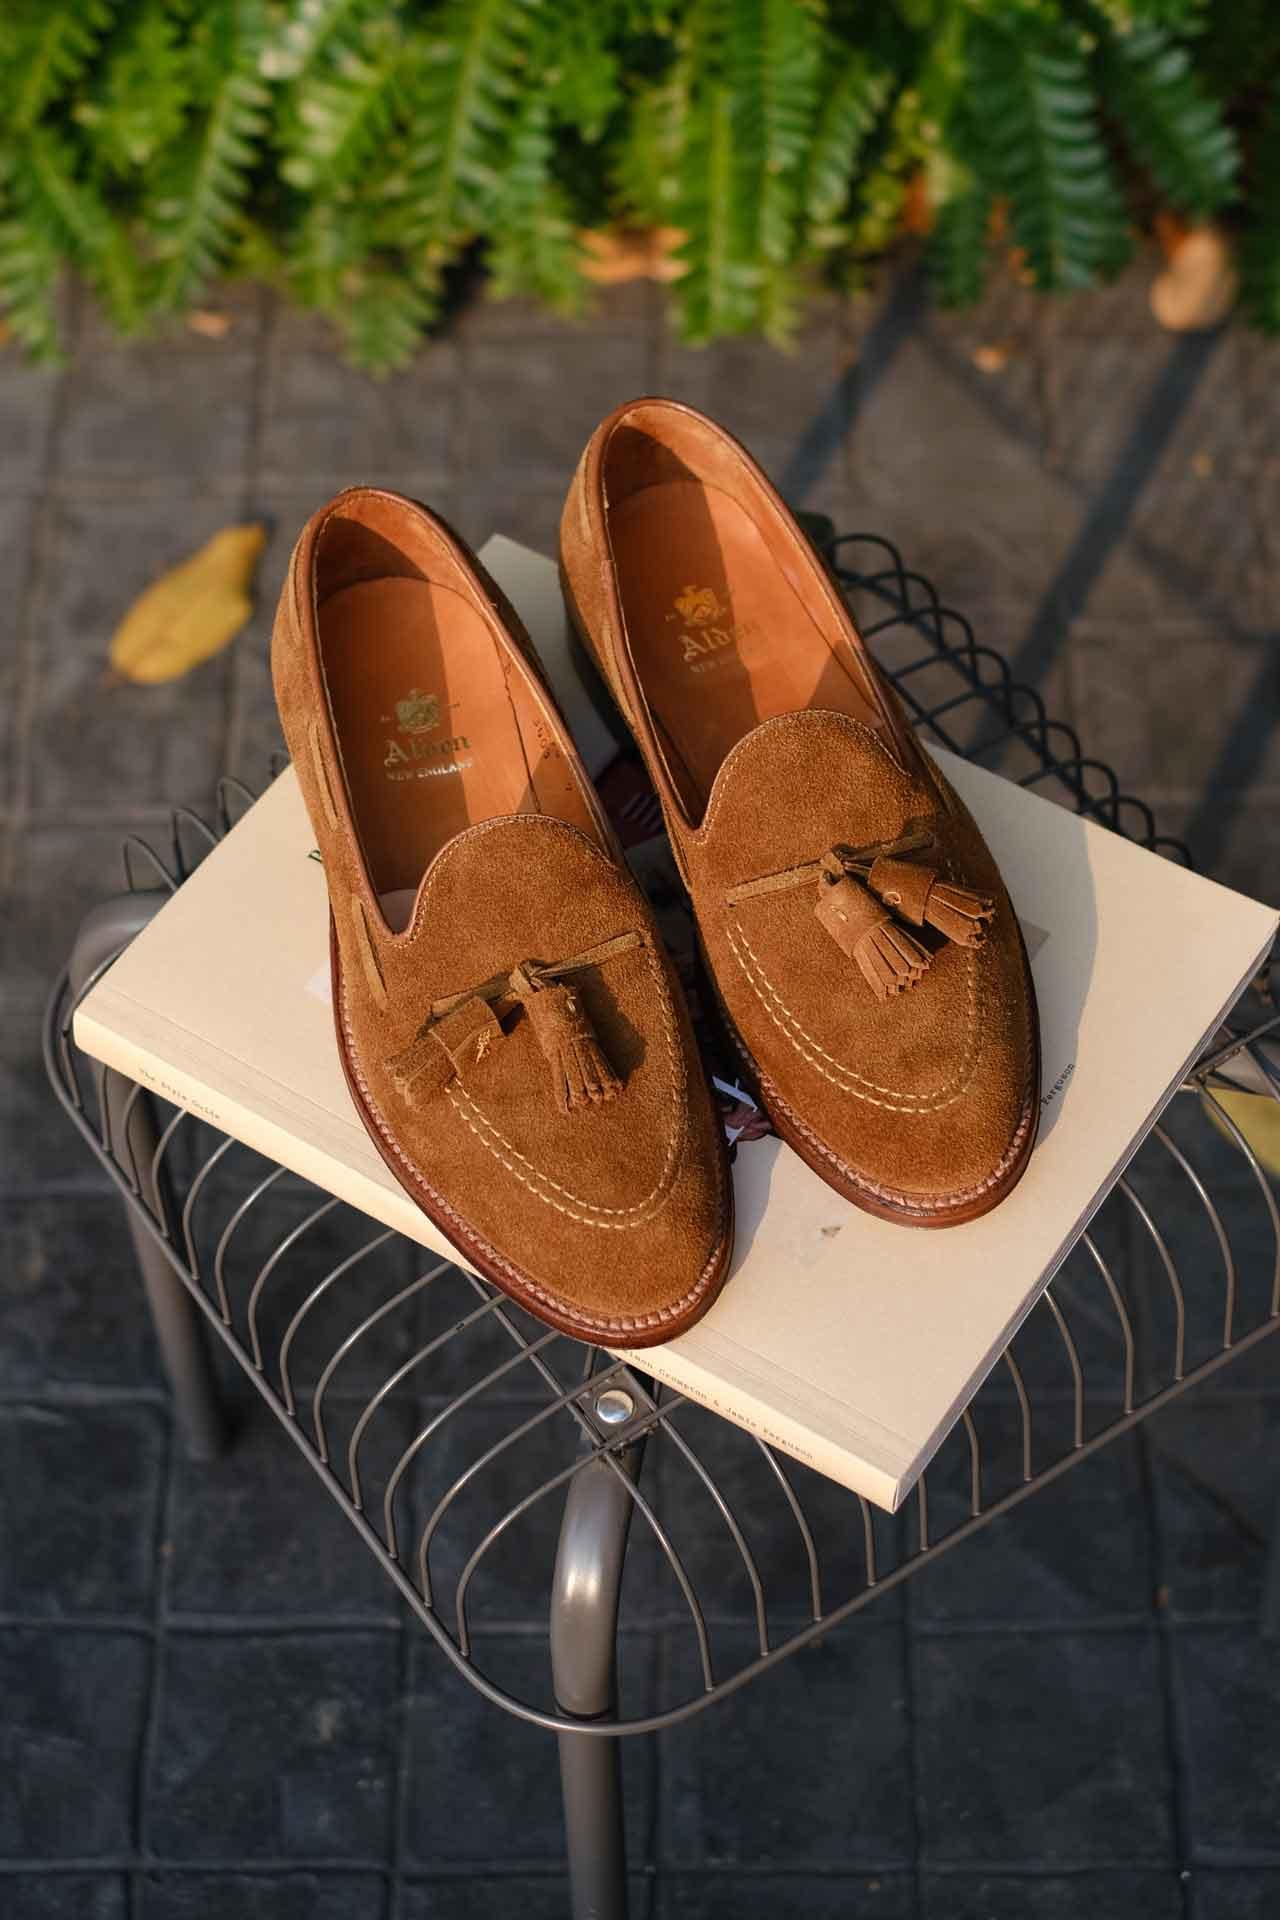 Alden Suede Tassel Loafers